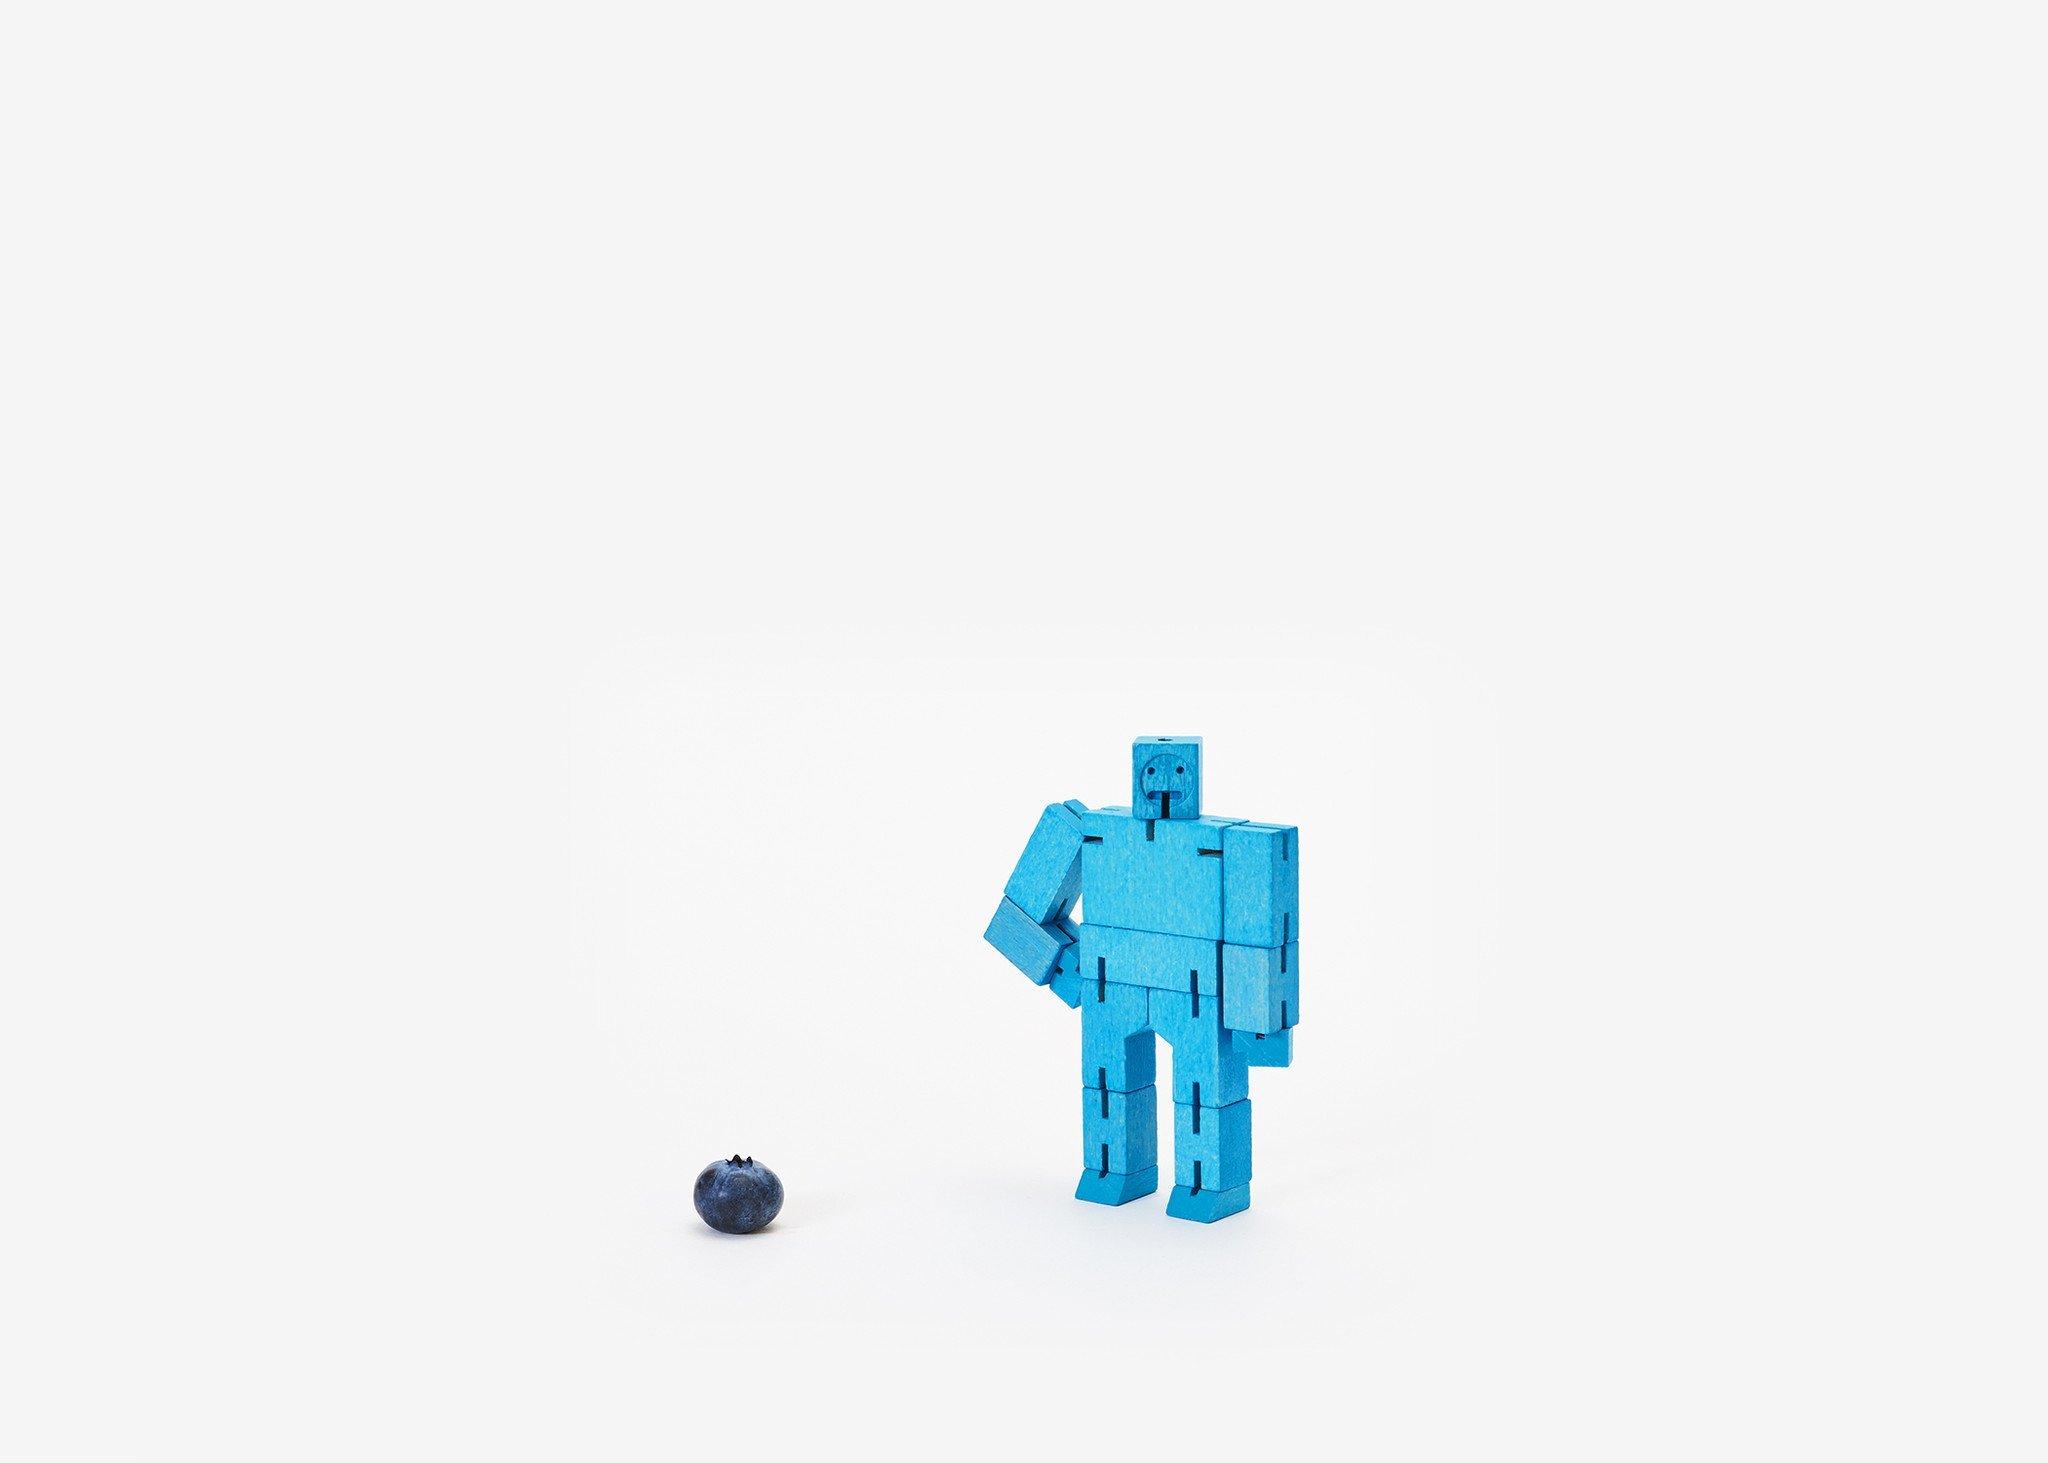 Cubebot blue micro colorstory dwc4b b07d6e00 4fb6 4e60 ada4 0e3dfde6beb5 3600x